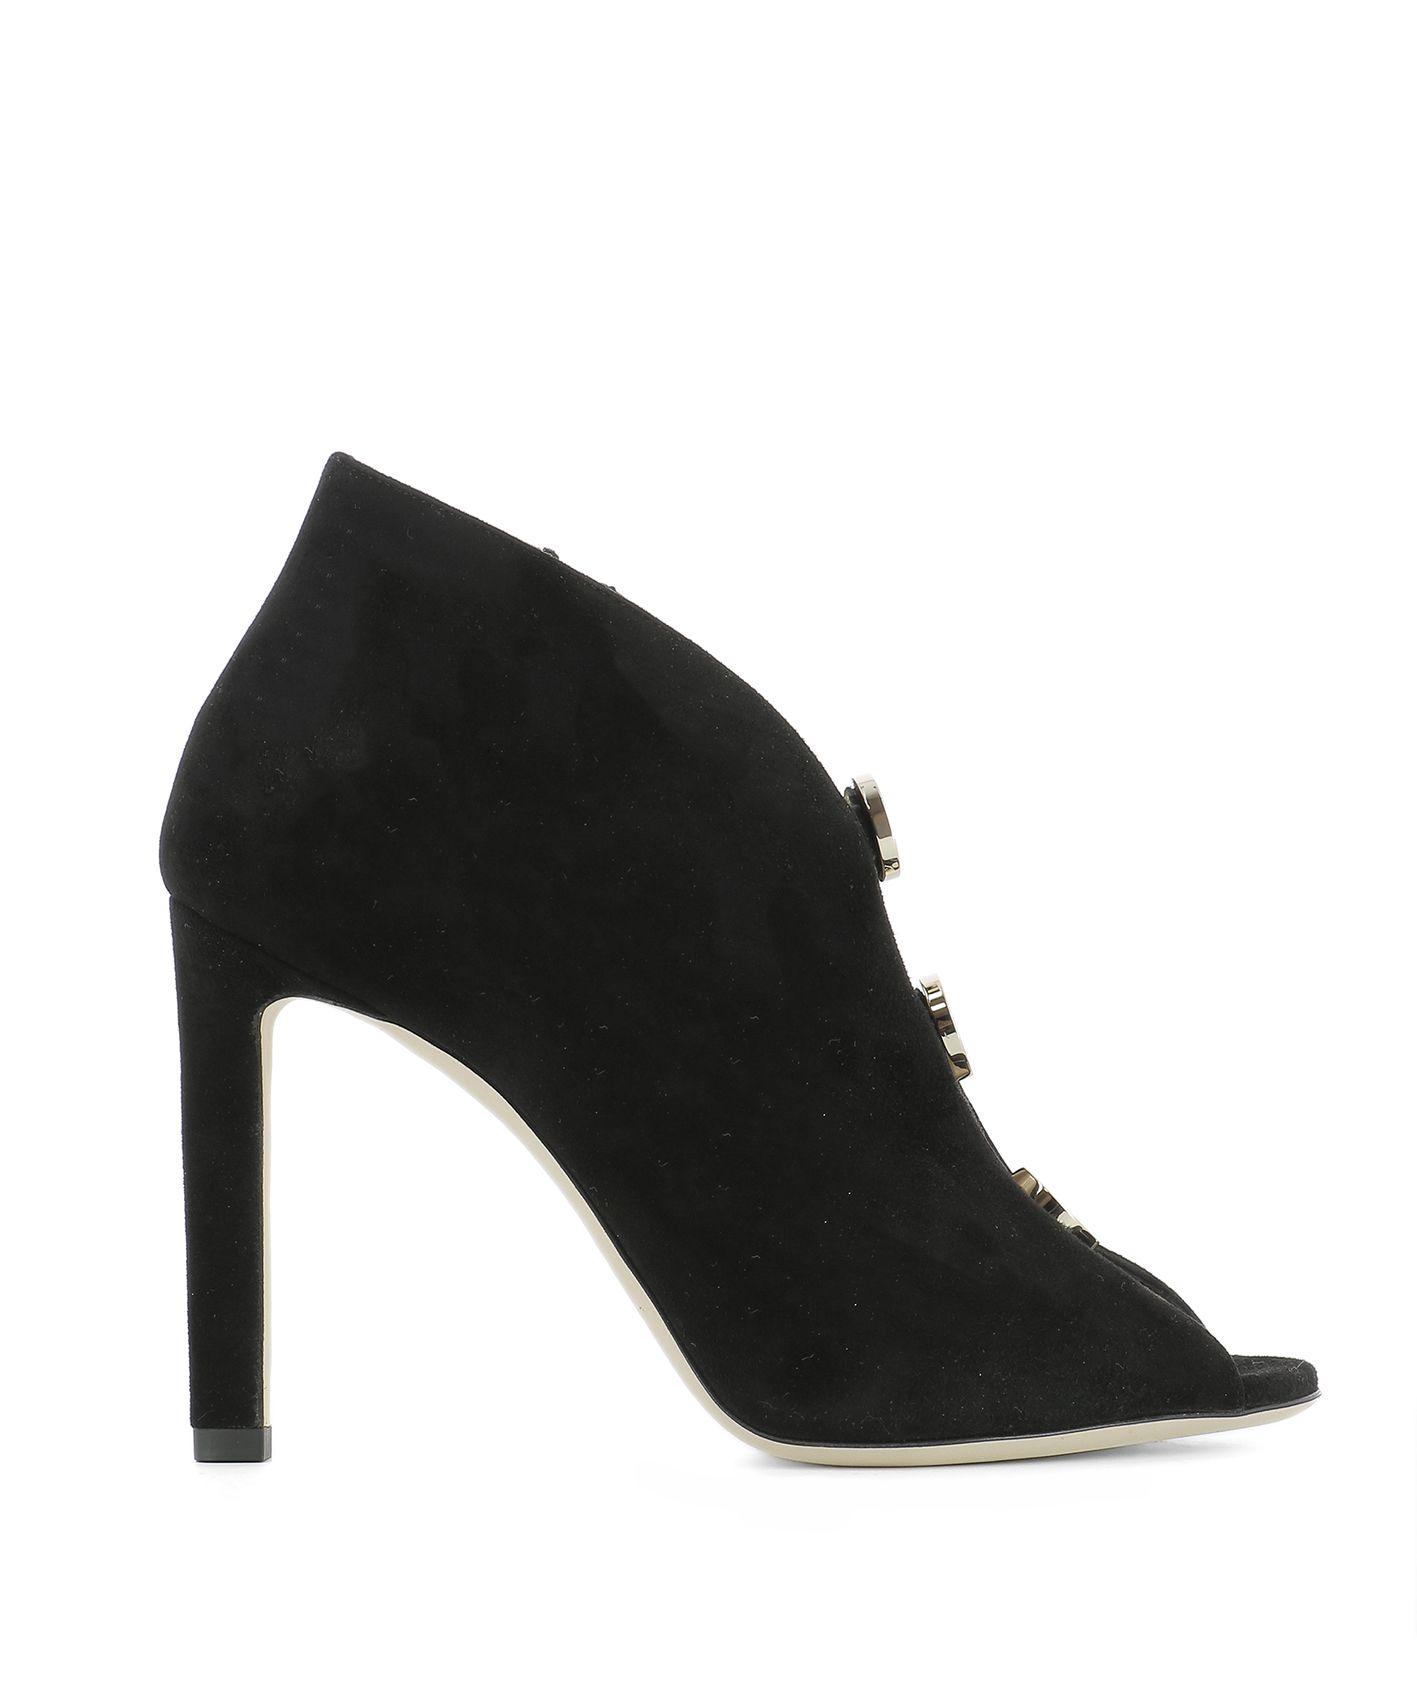 Black Suede Lorna Sandals